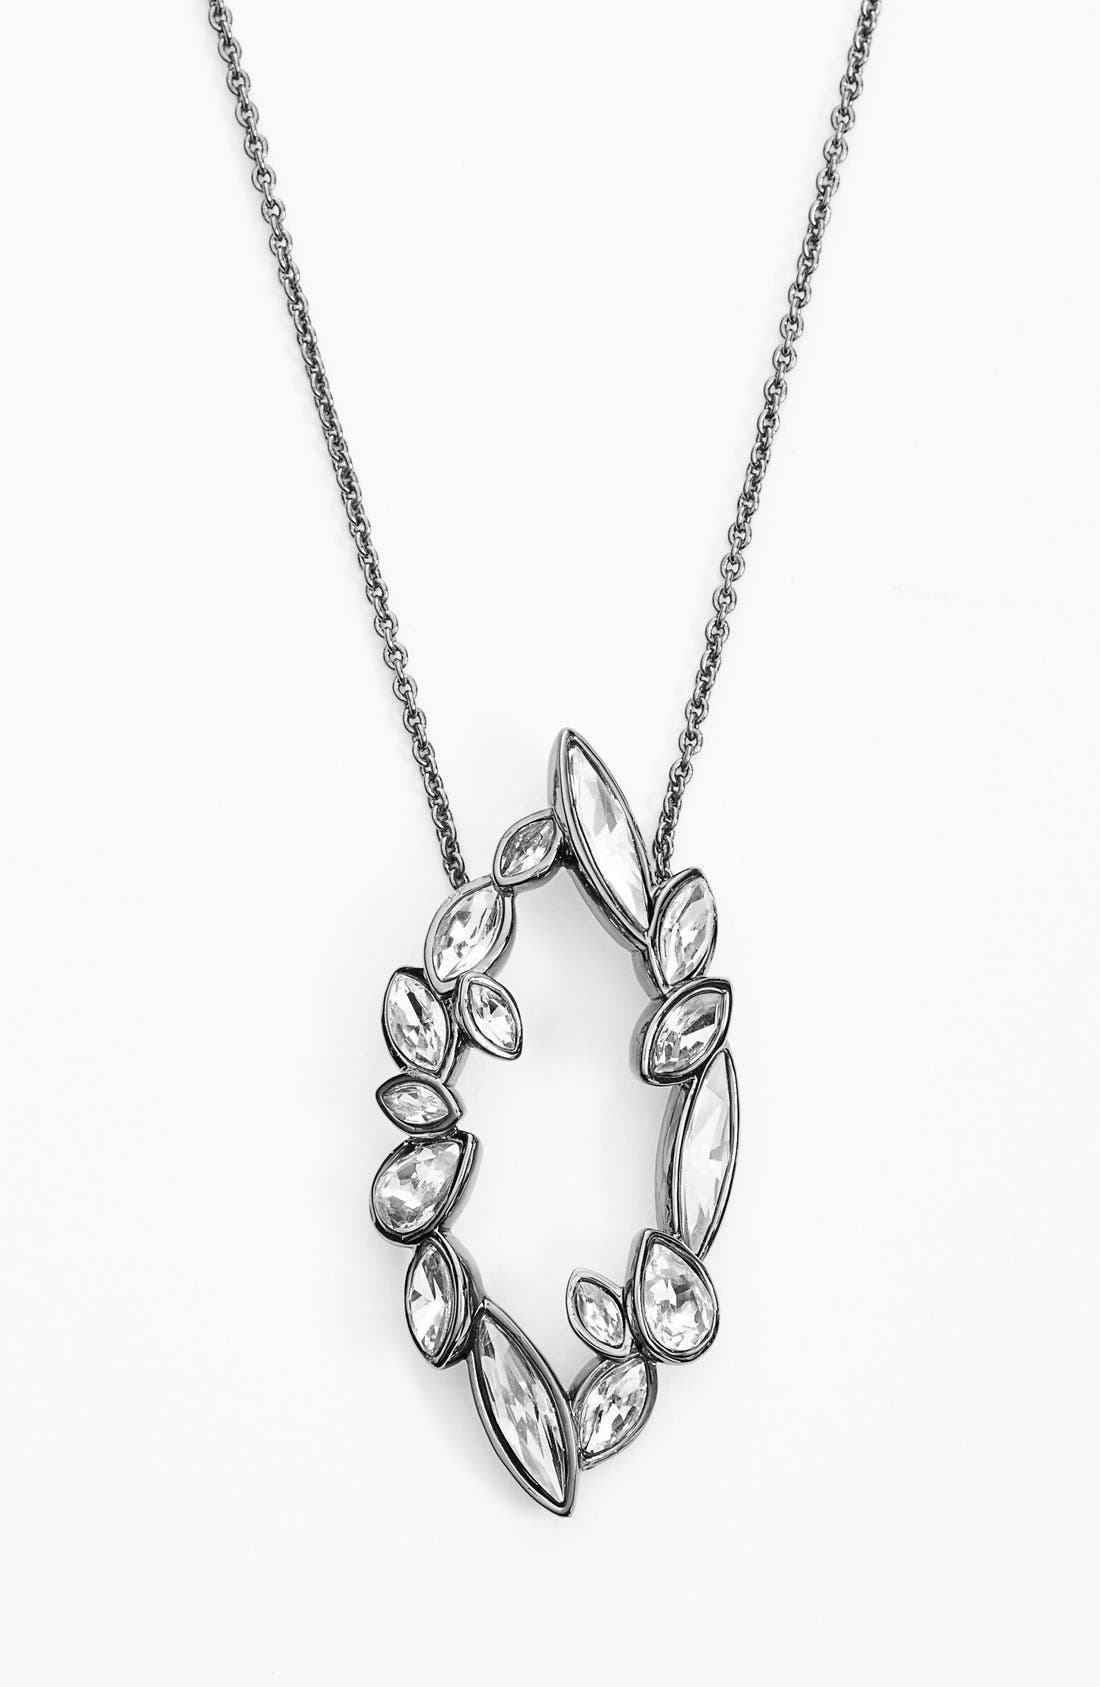 Main Image - Alexis Bittar 'Miss Havisham' Pendant Necklace